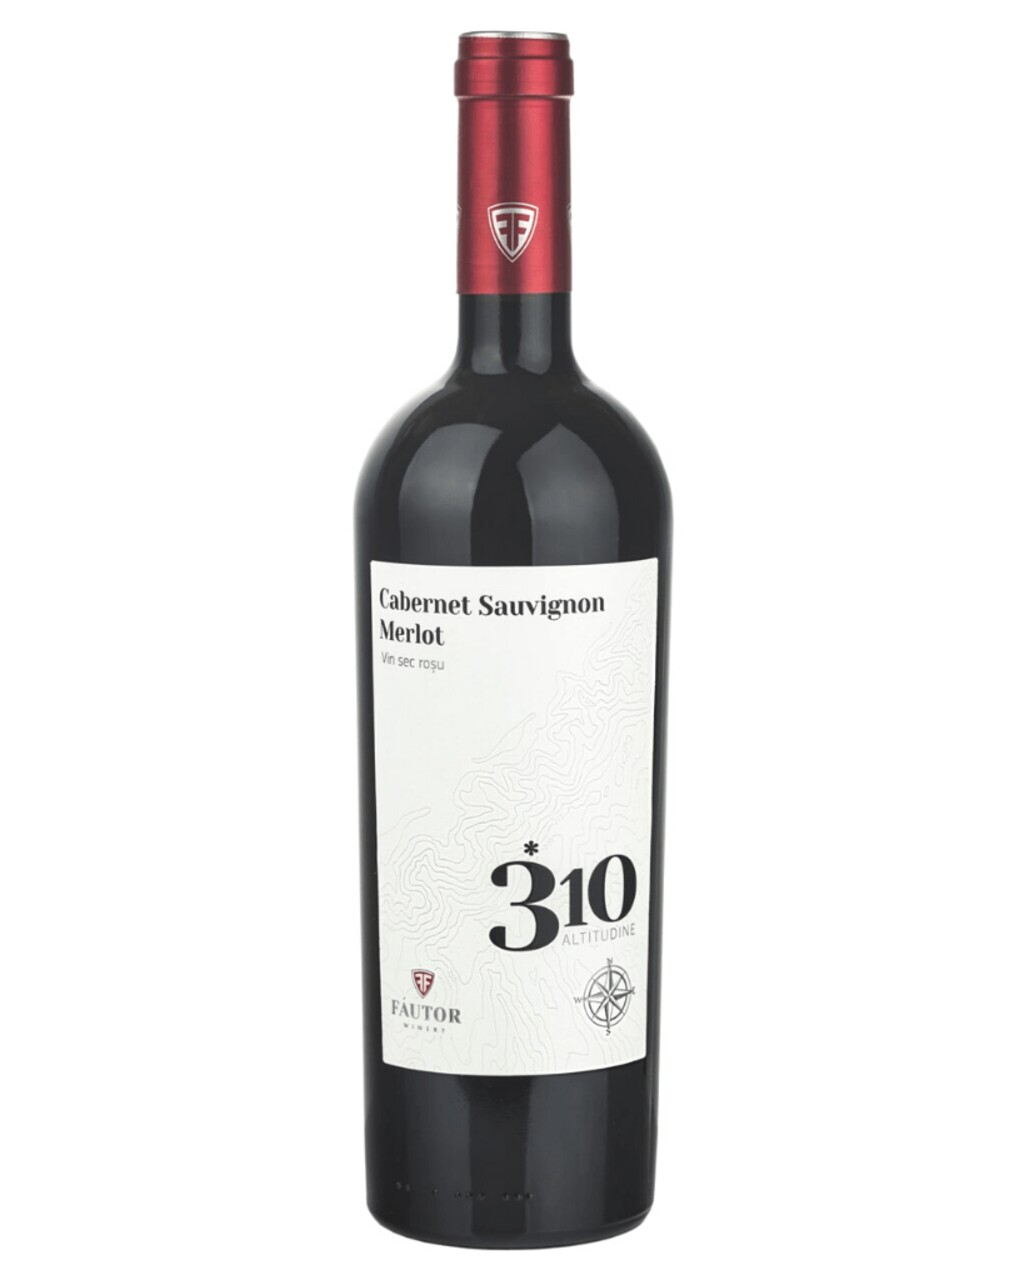 Fautor 310 Altitudine Cabernet Sauvignon & Merlot